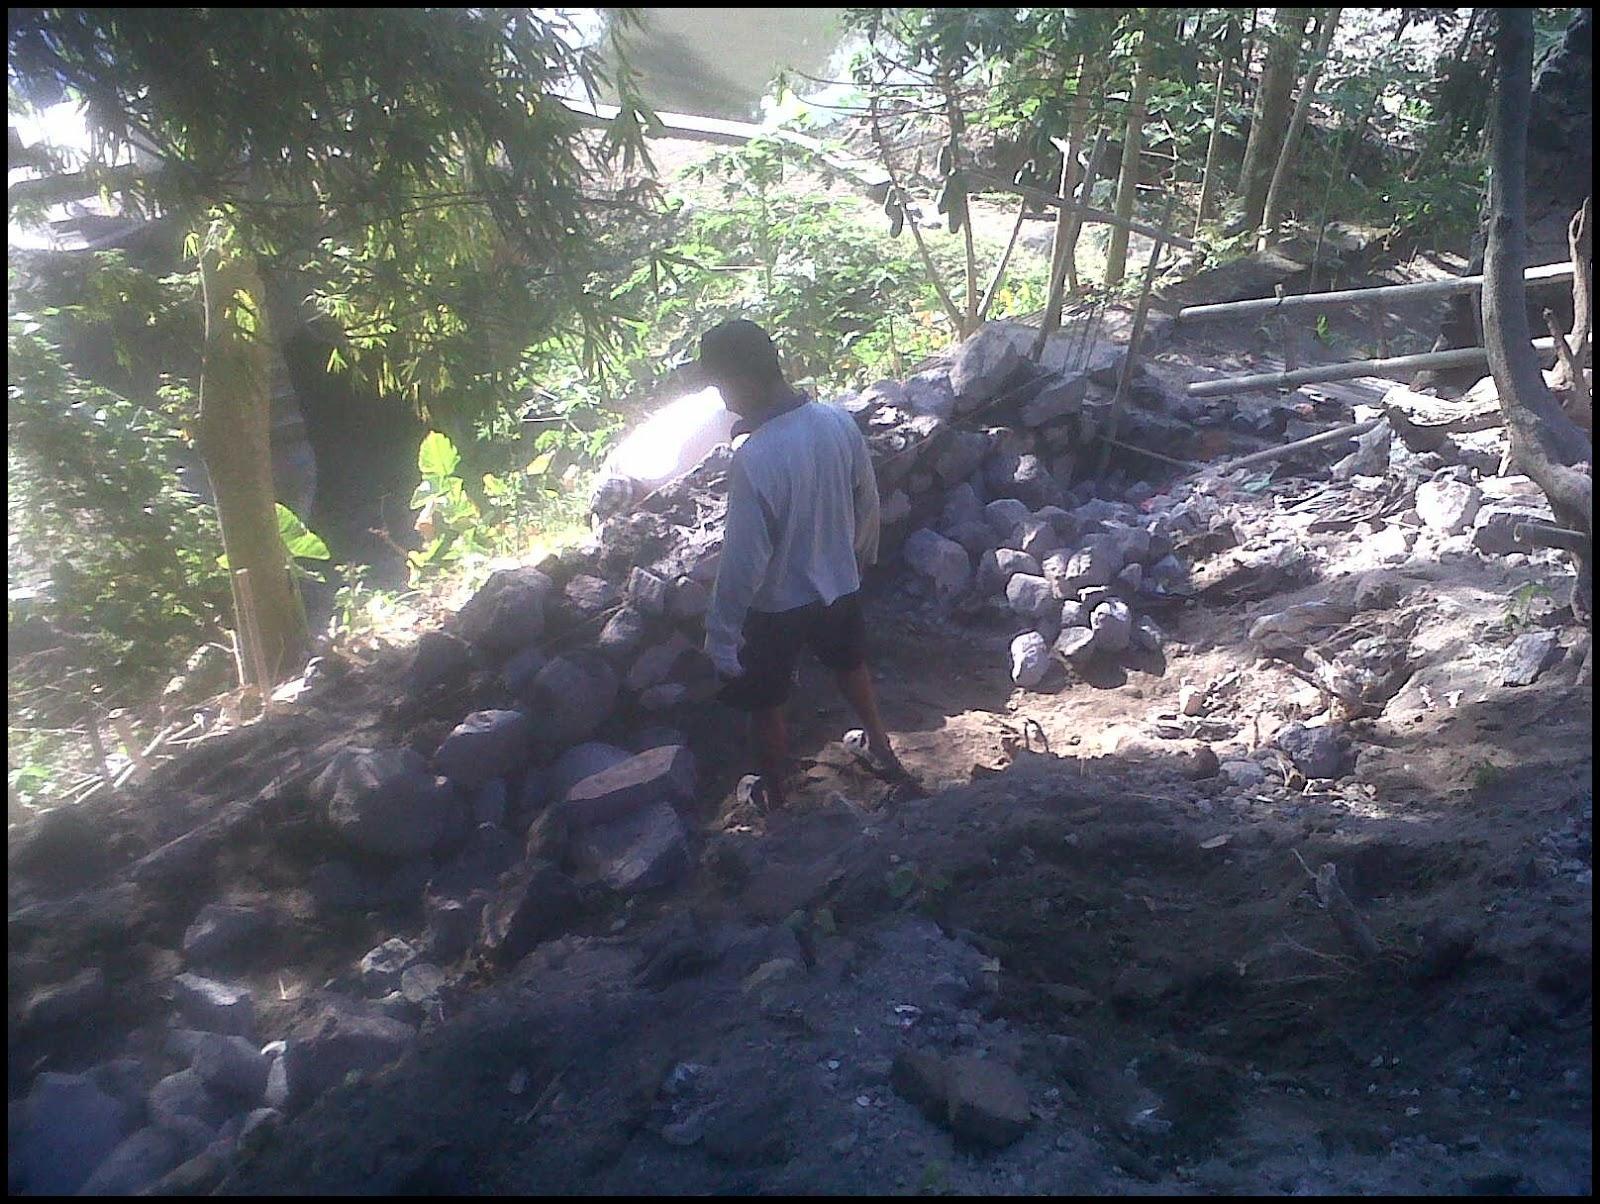 Jasa Renovasi Rumah, Kos, Homestay di Surakarta / Solo